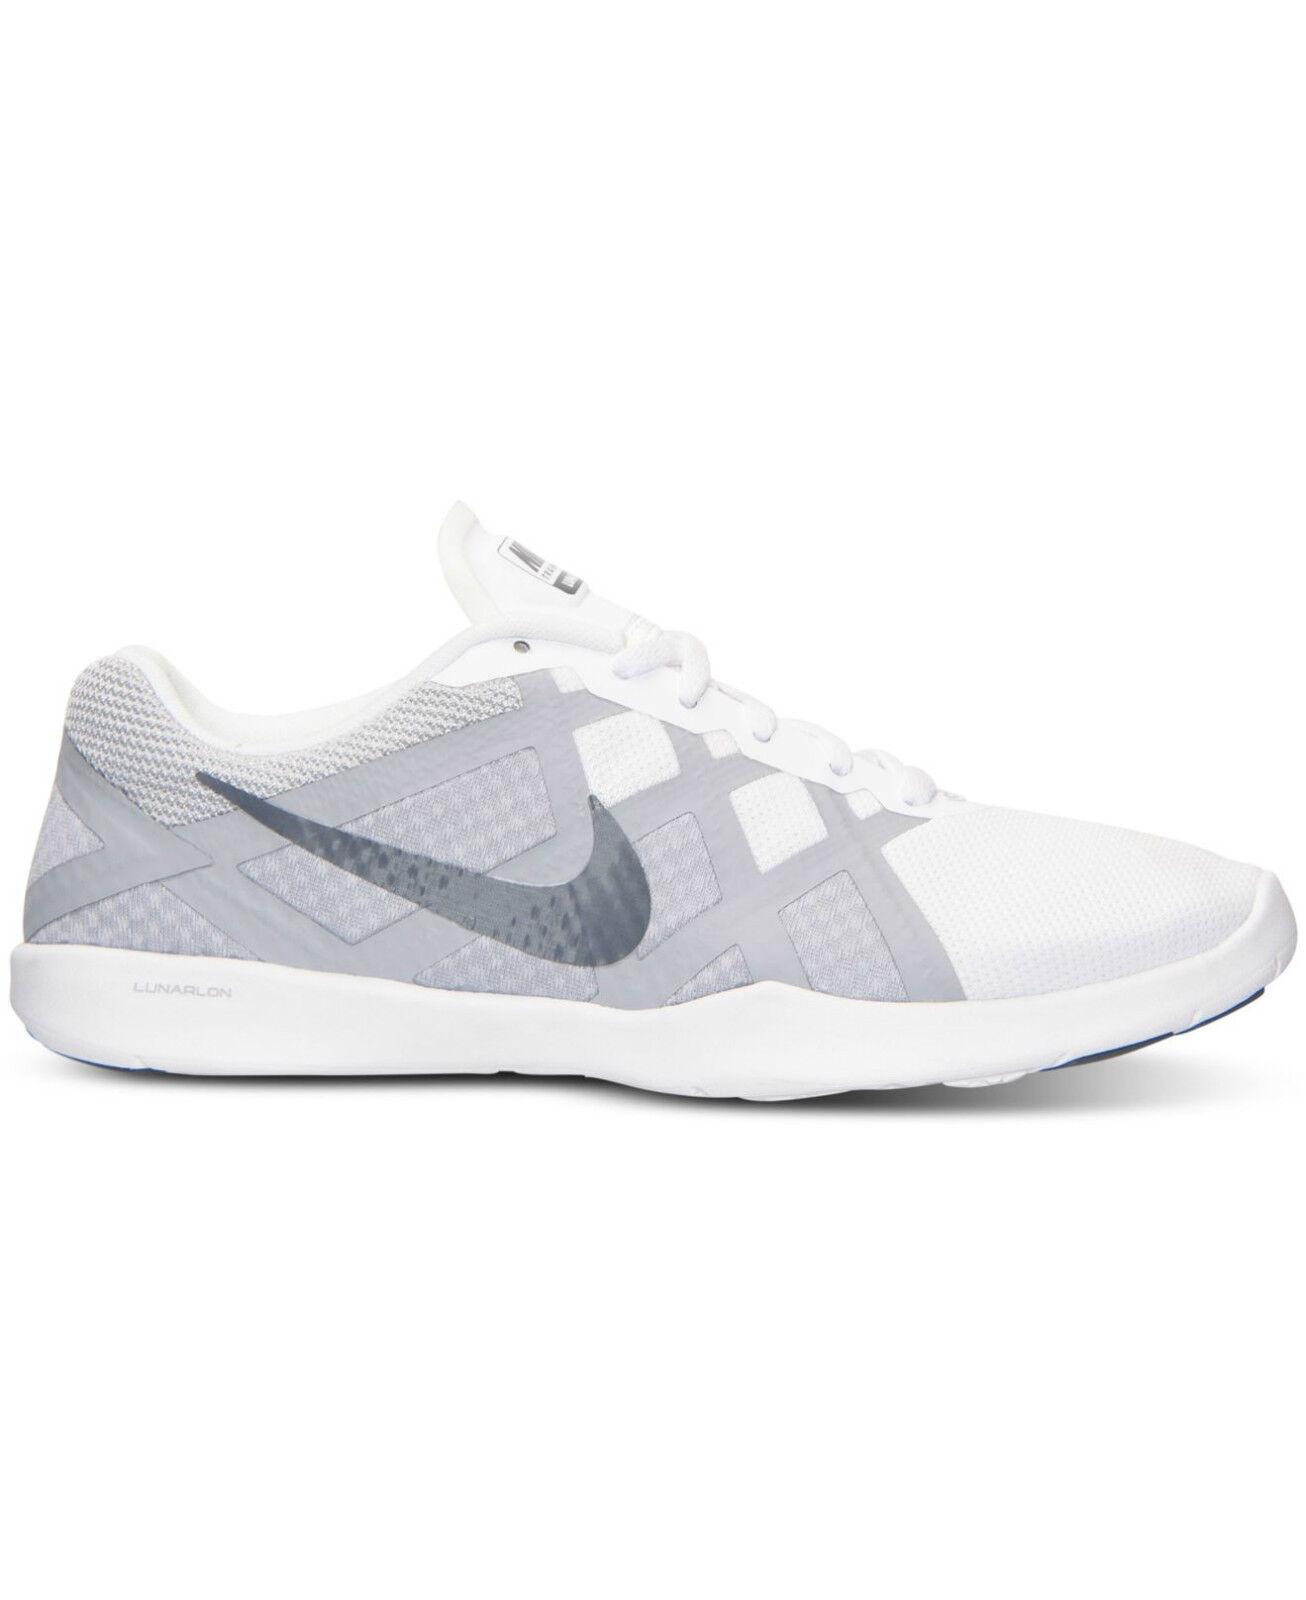 Nike Lunar Lux TR 749183-100 Training Shoe Women's SZ 10